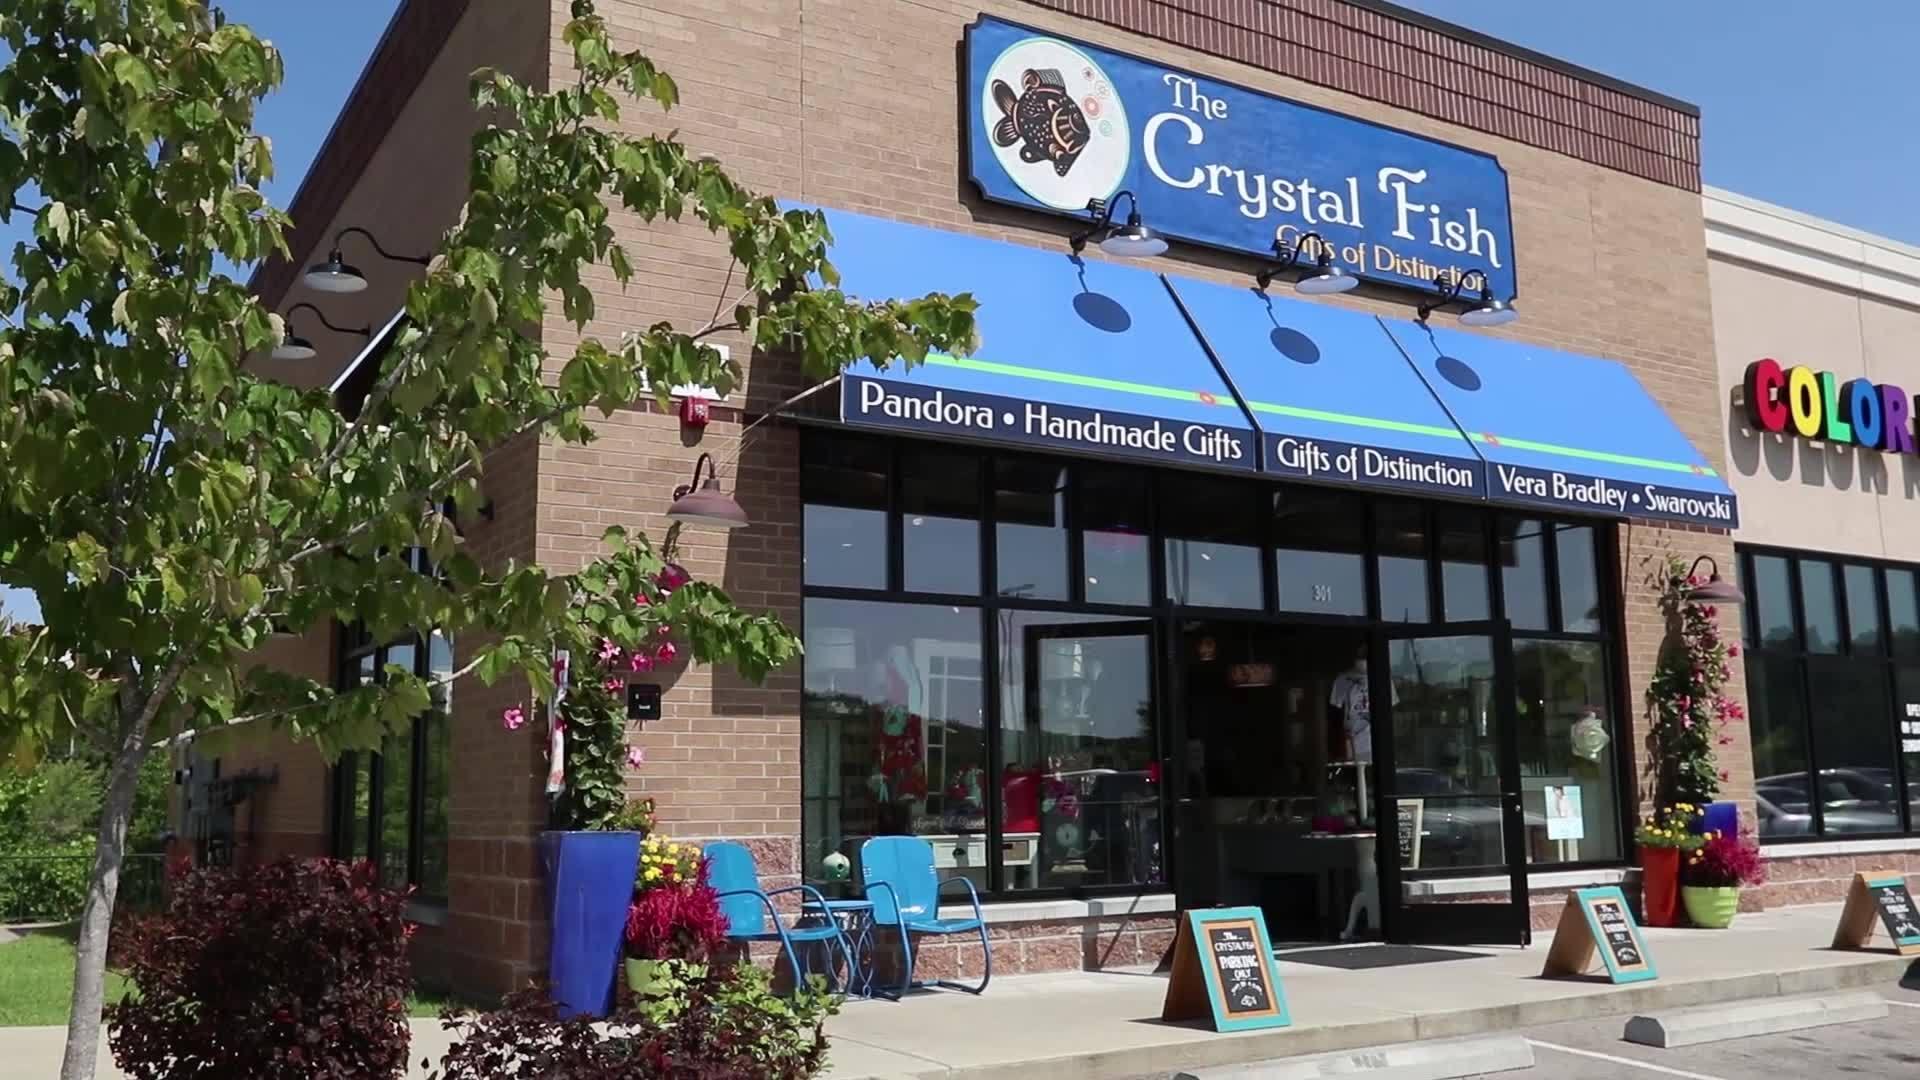 Best of Branson - Crystal Fish